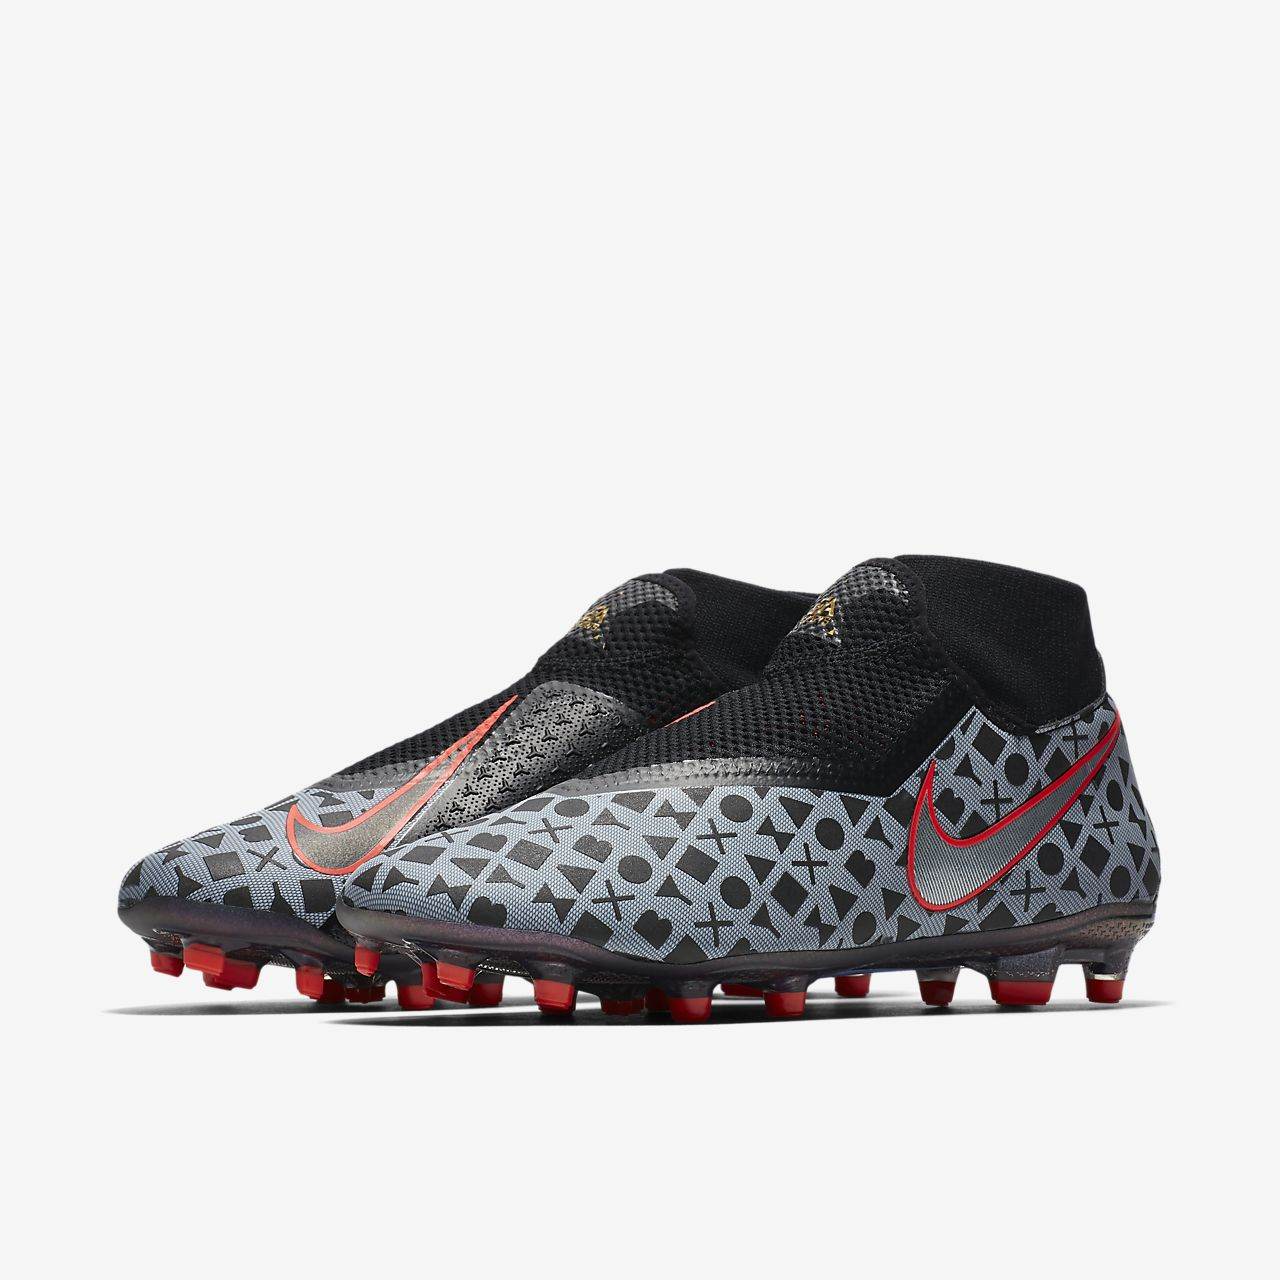 ... EA Sports X Nike Phantom Vision Academy Dynamic Fit MG Botas de fútbol  para múltiples superficies aa64d078d0267